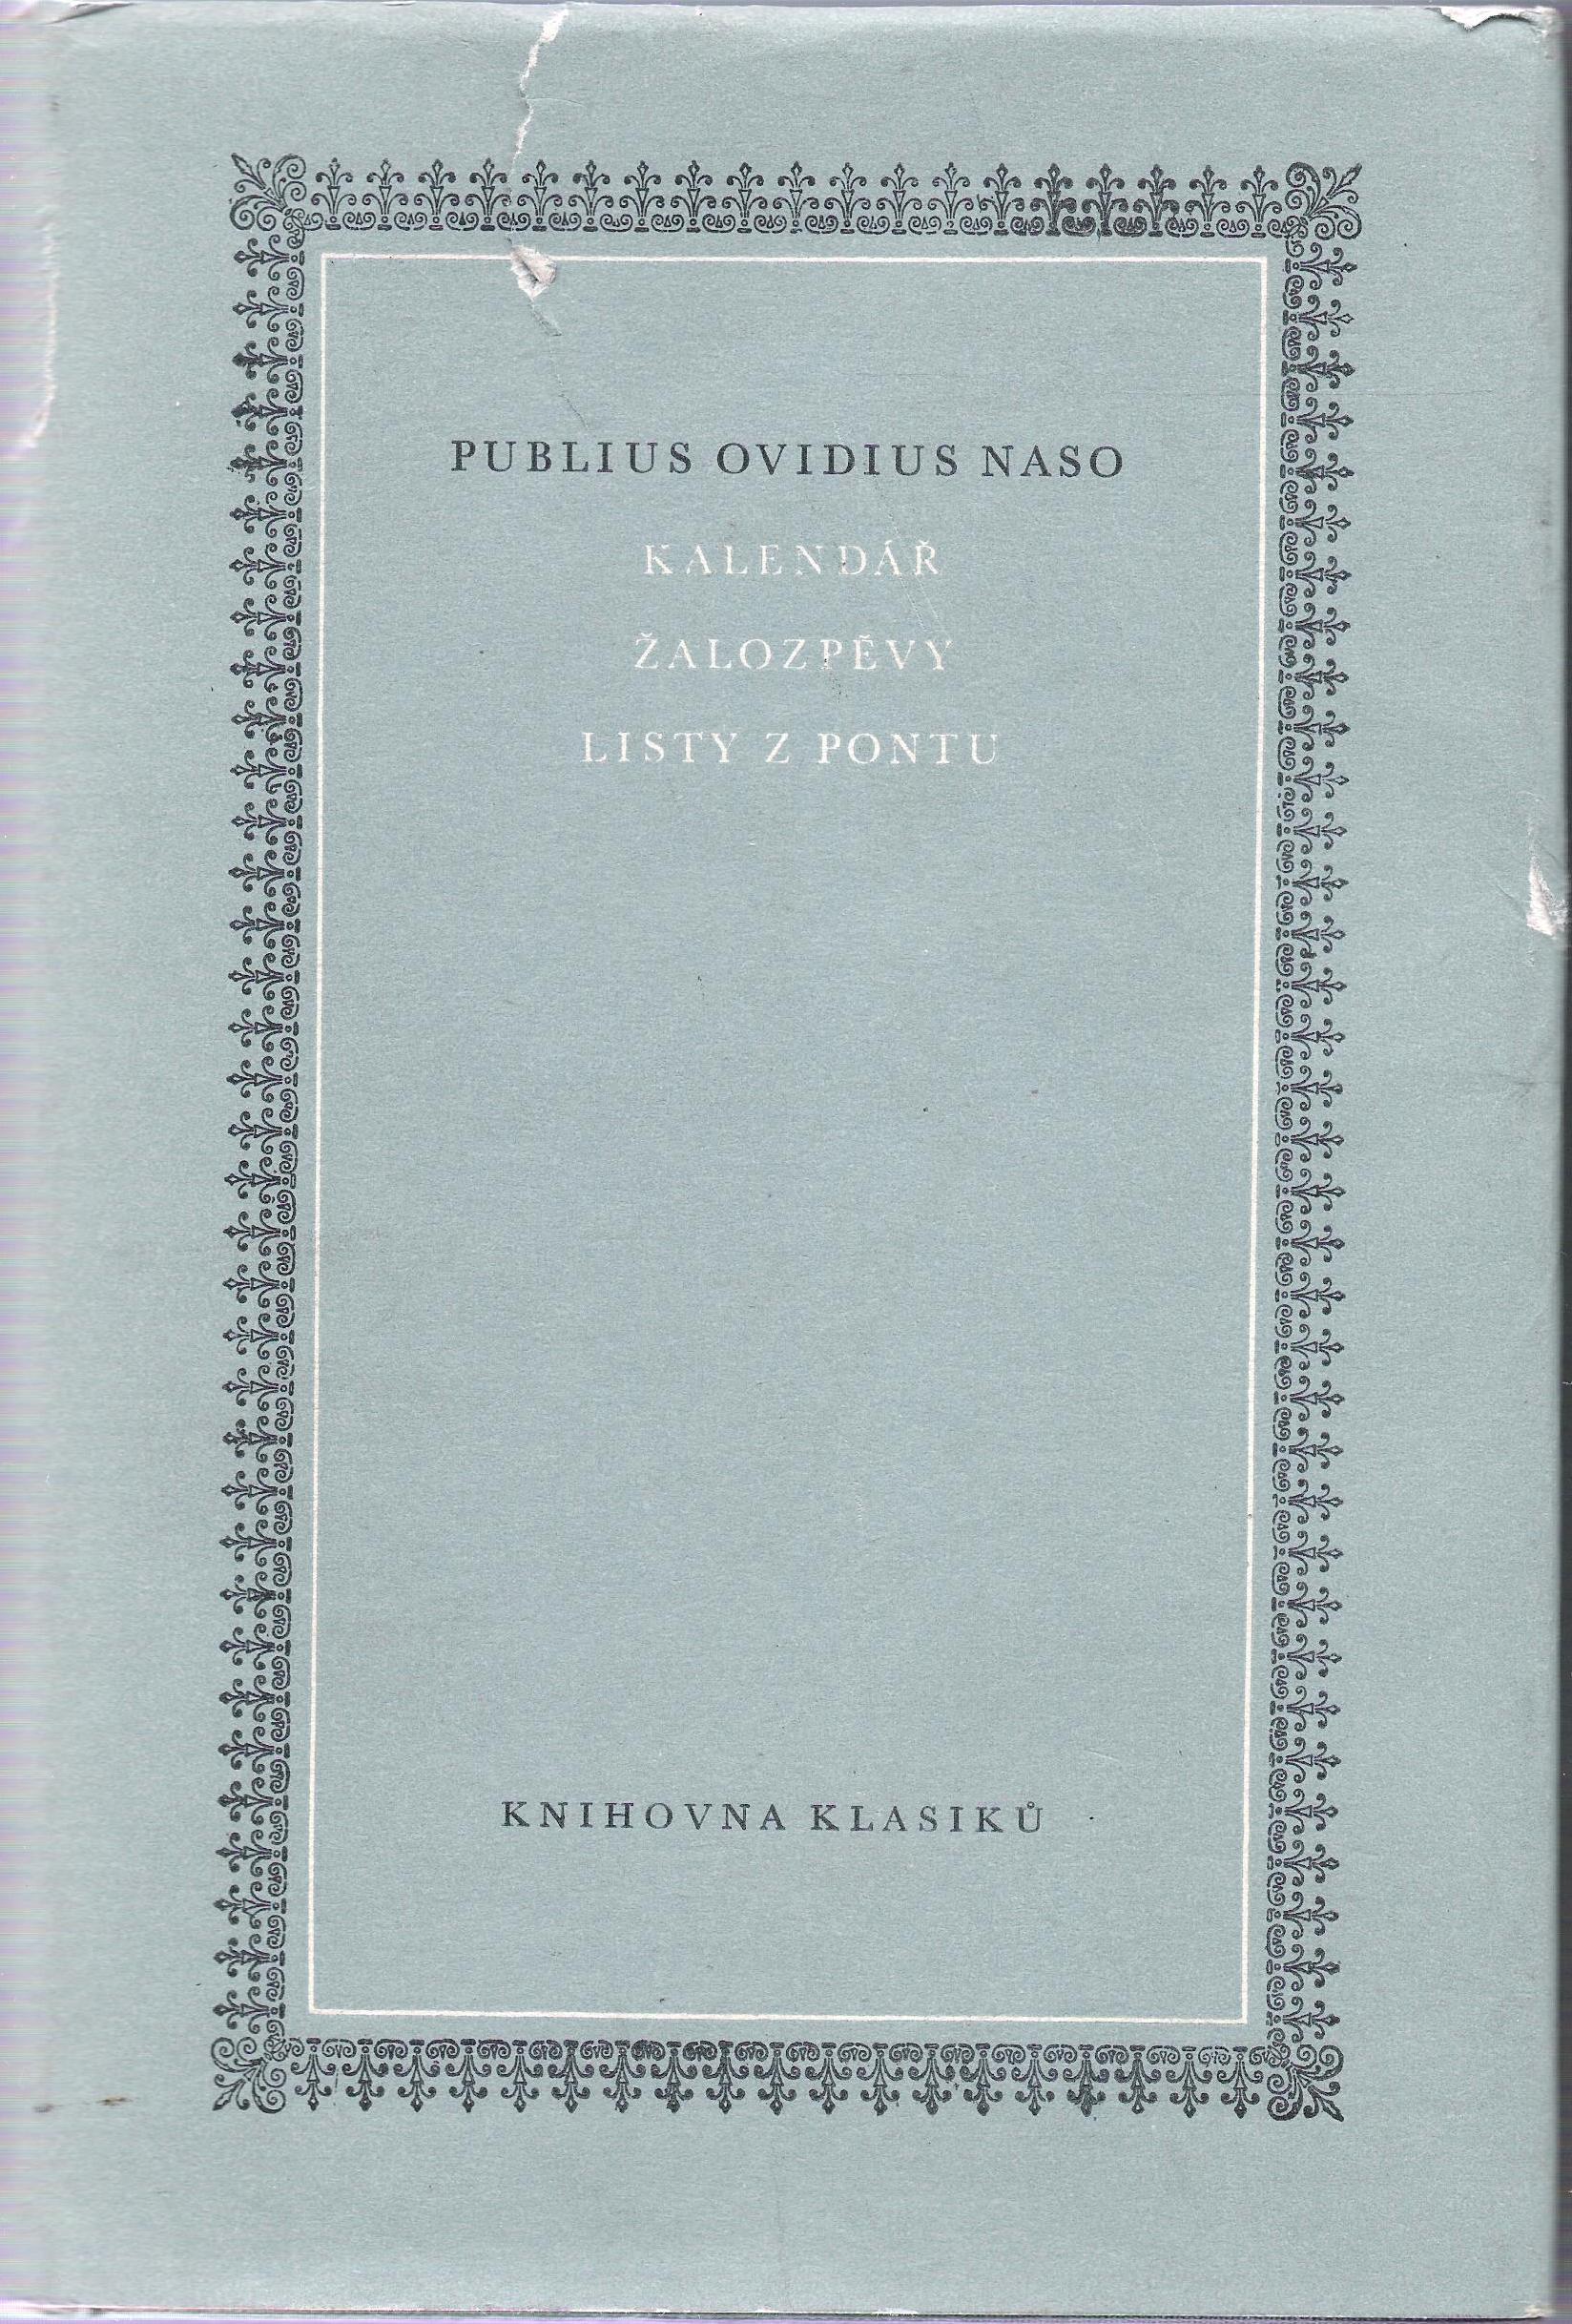 Kalendář, Žalozpěvy, Listy z Pontu - Publius Ovidius Naso